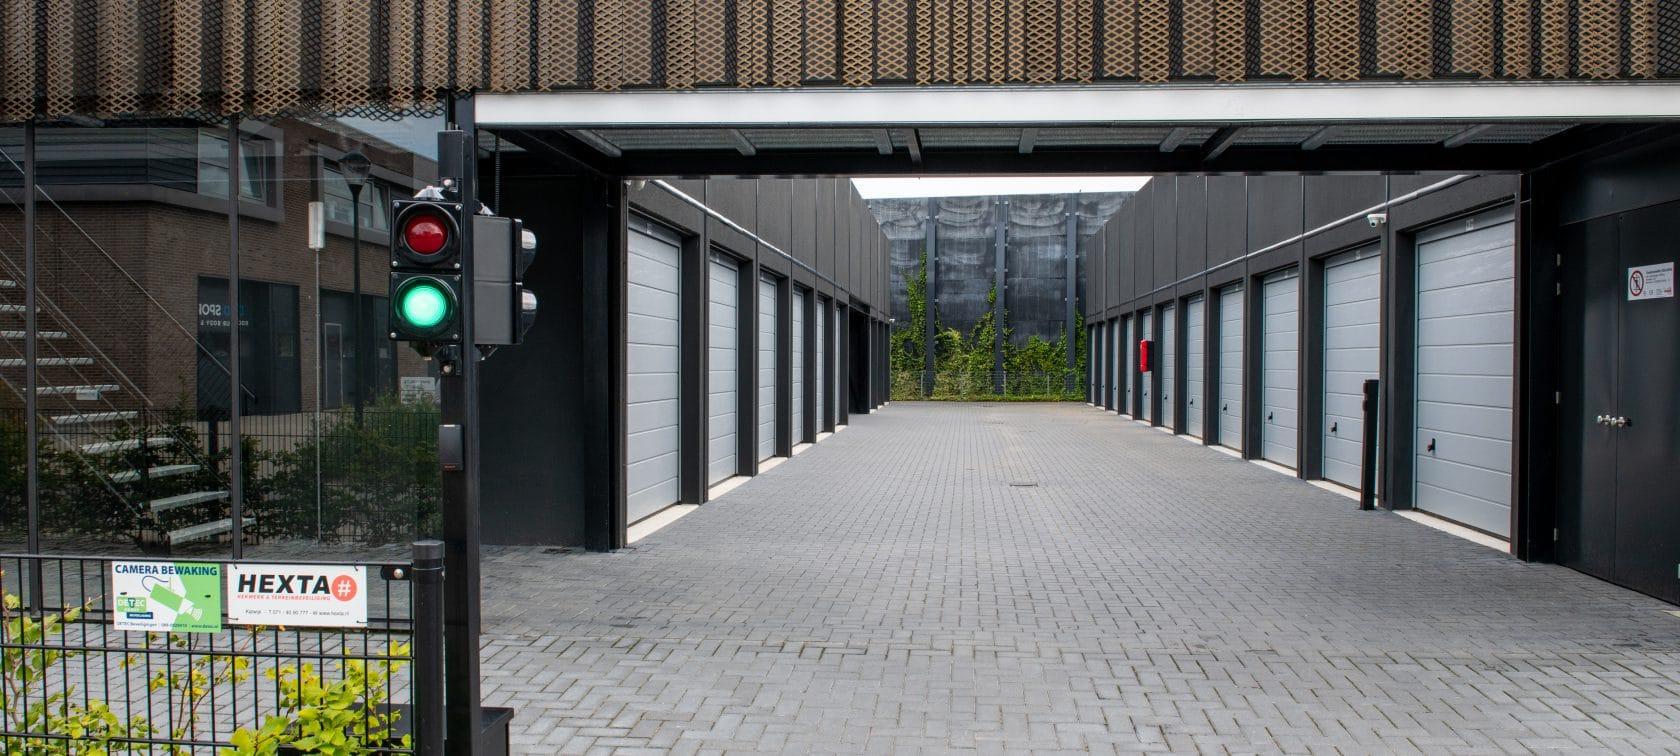 GaragePark Blaricum - garageboxen - opslagruimte - werkruimte(